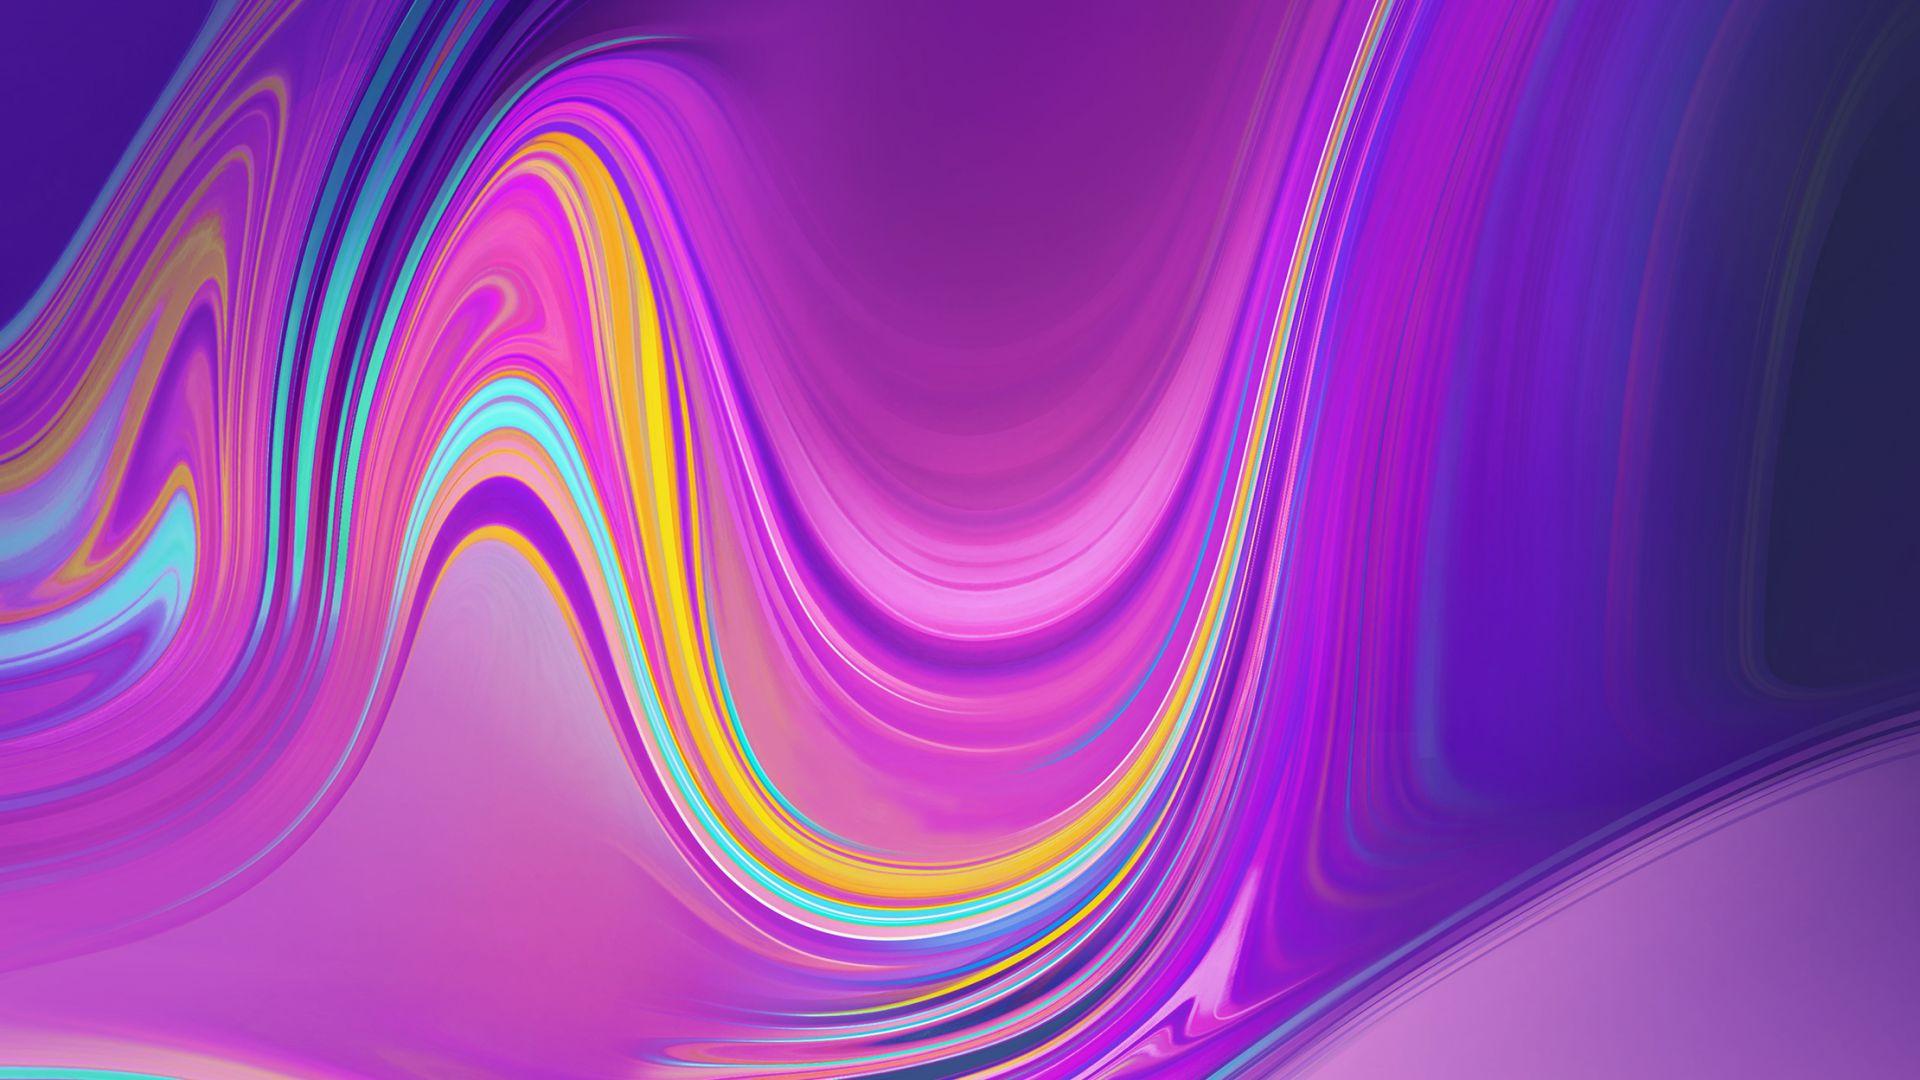 Samsung Hd Wallpapers: Wallpaper Samsung Galaxy A9, Samsung Galaxy A7, Android 8